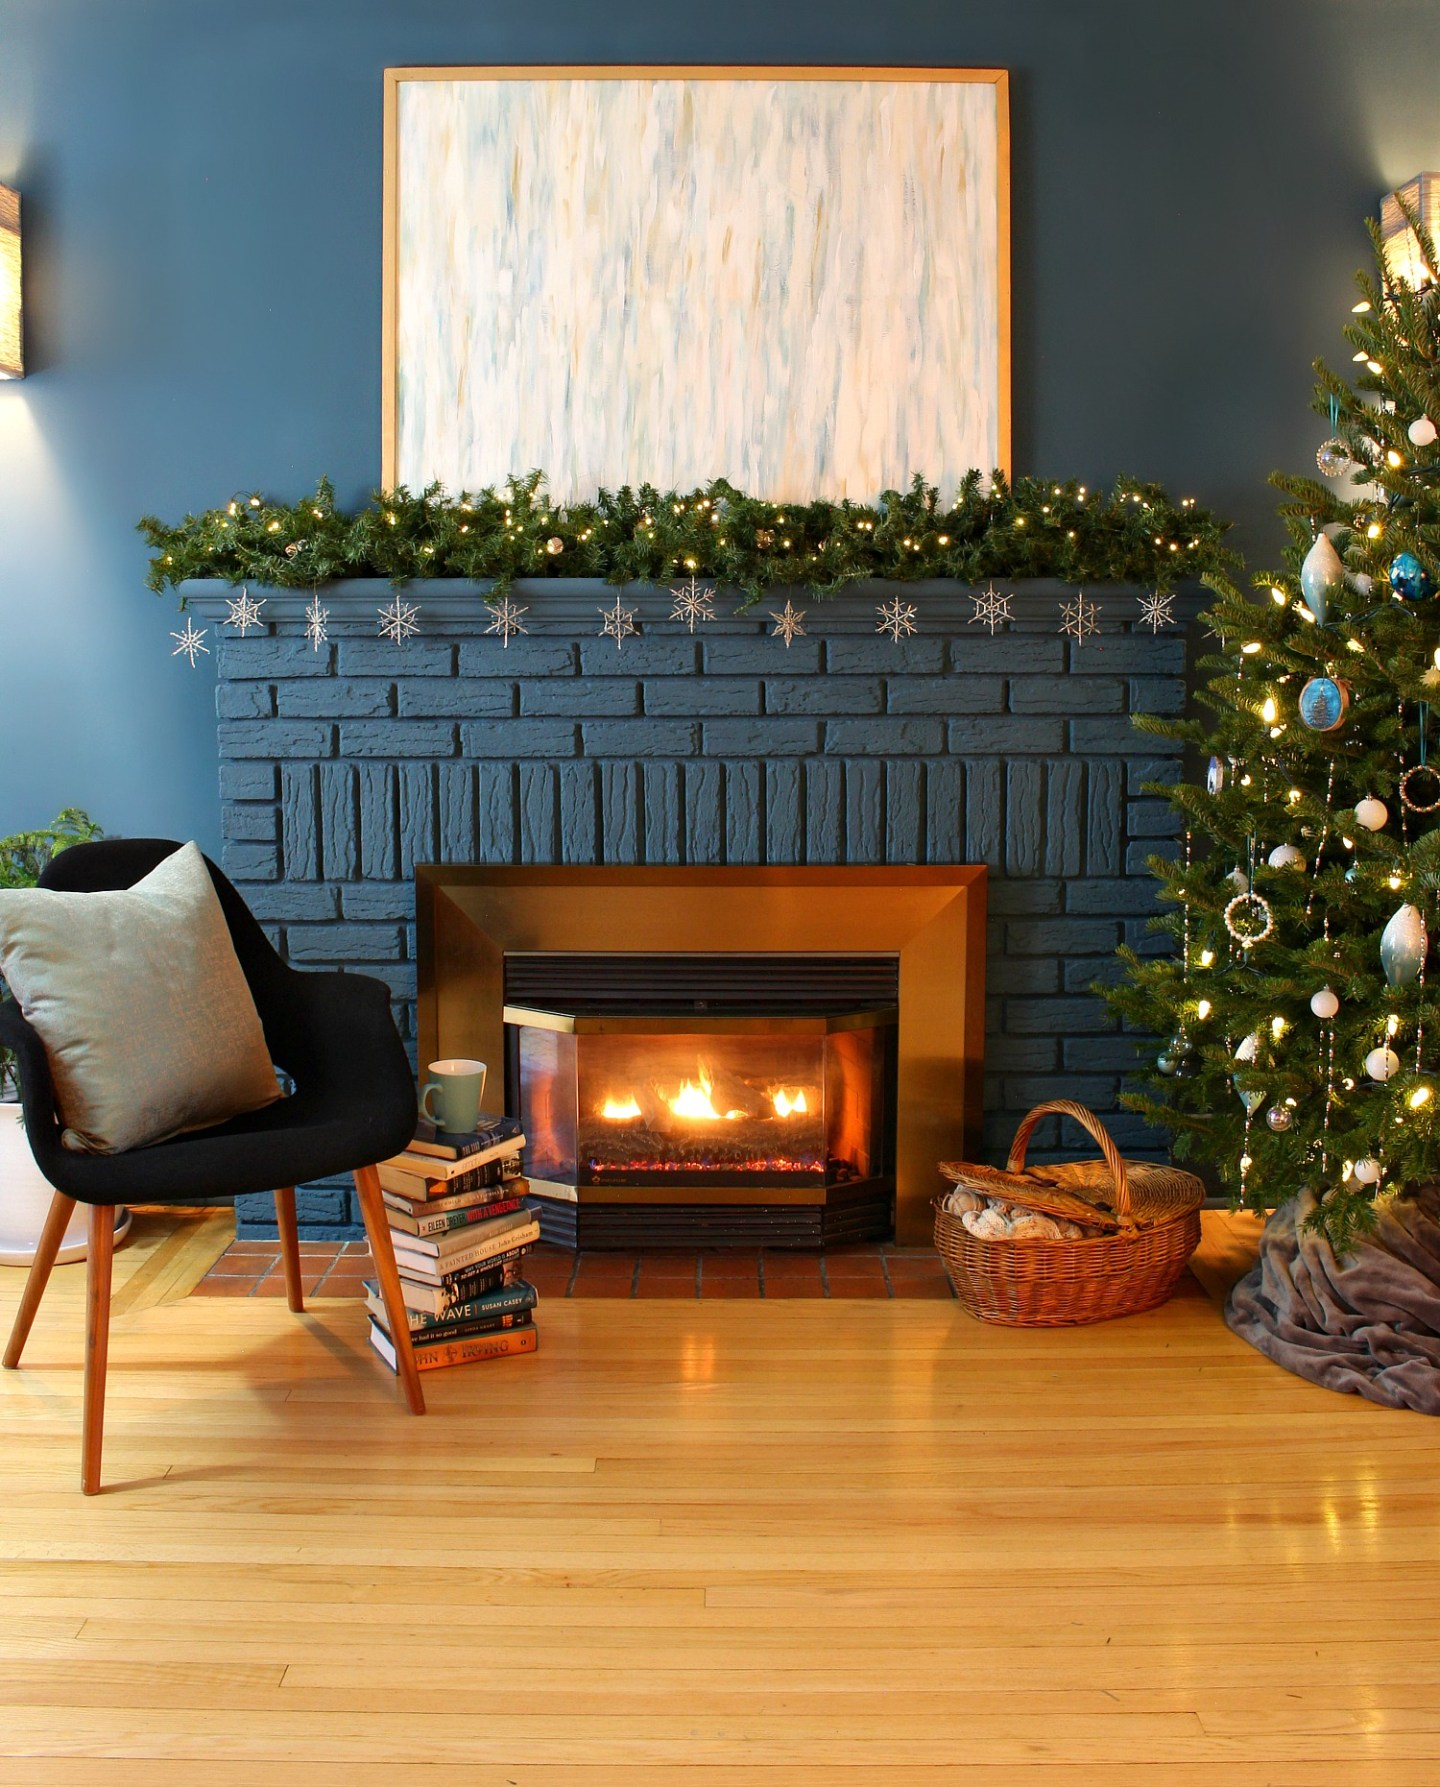 Dark Blue Fireplace with Winter Mantel Decor